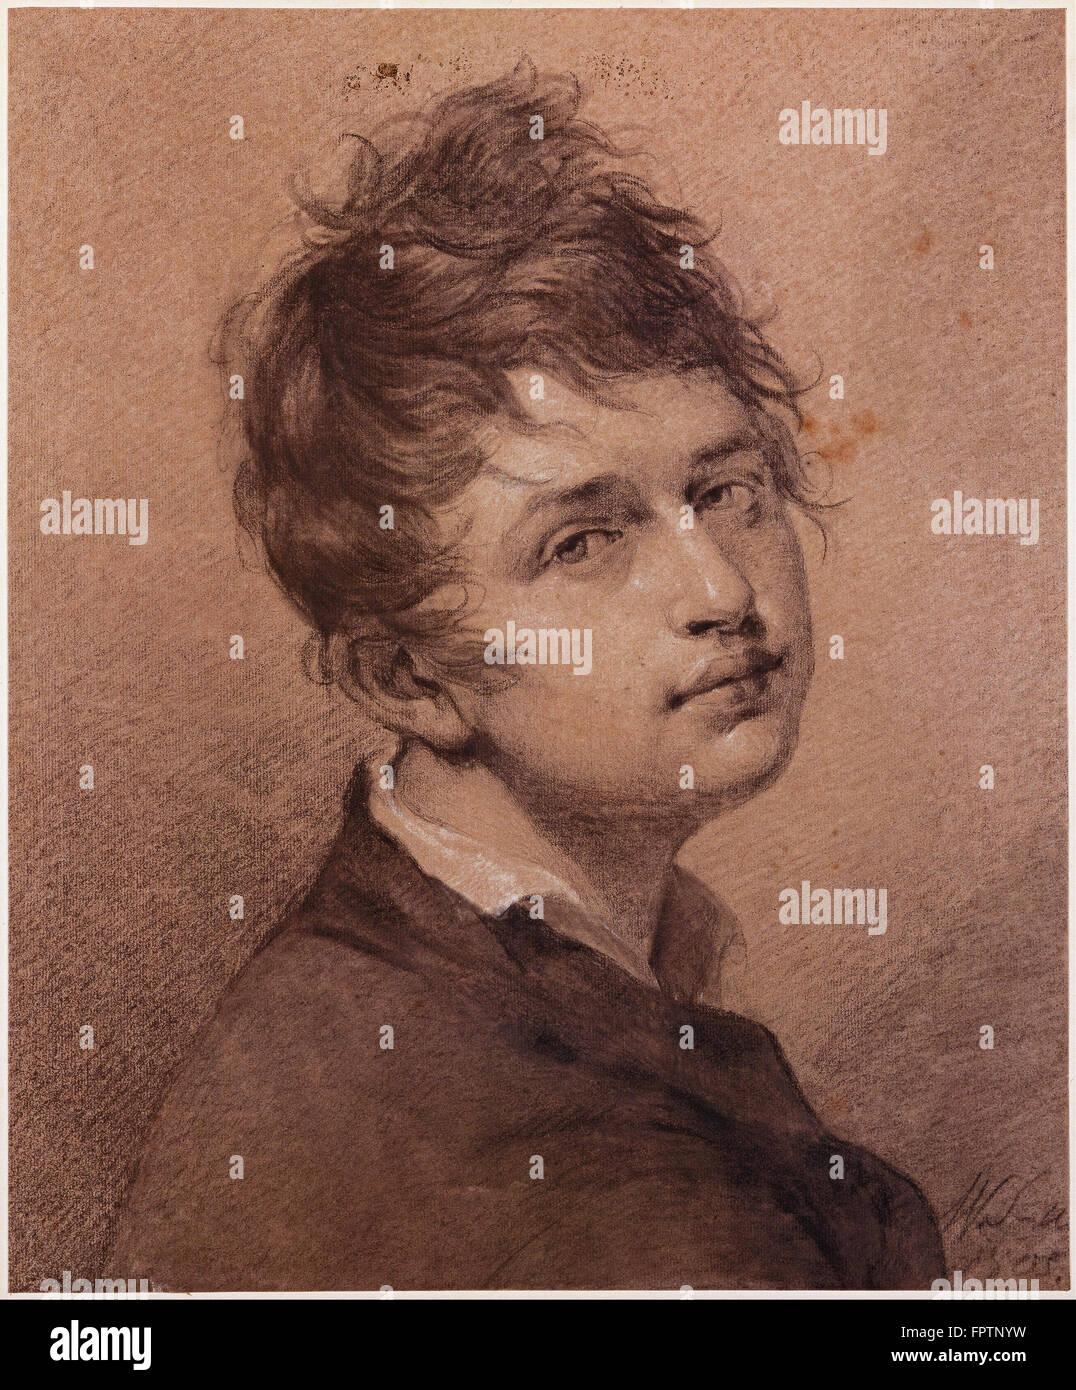 Friedrich Wilhelm Schadow - Autorretrato - 1805 Foto de stock